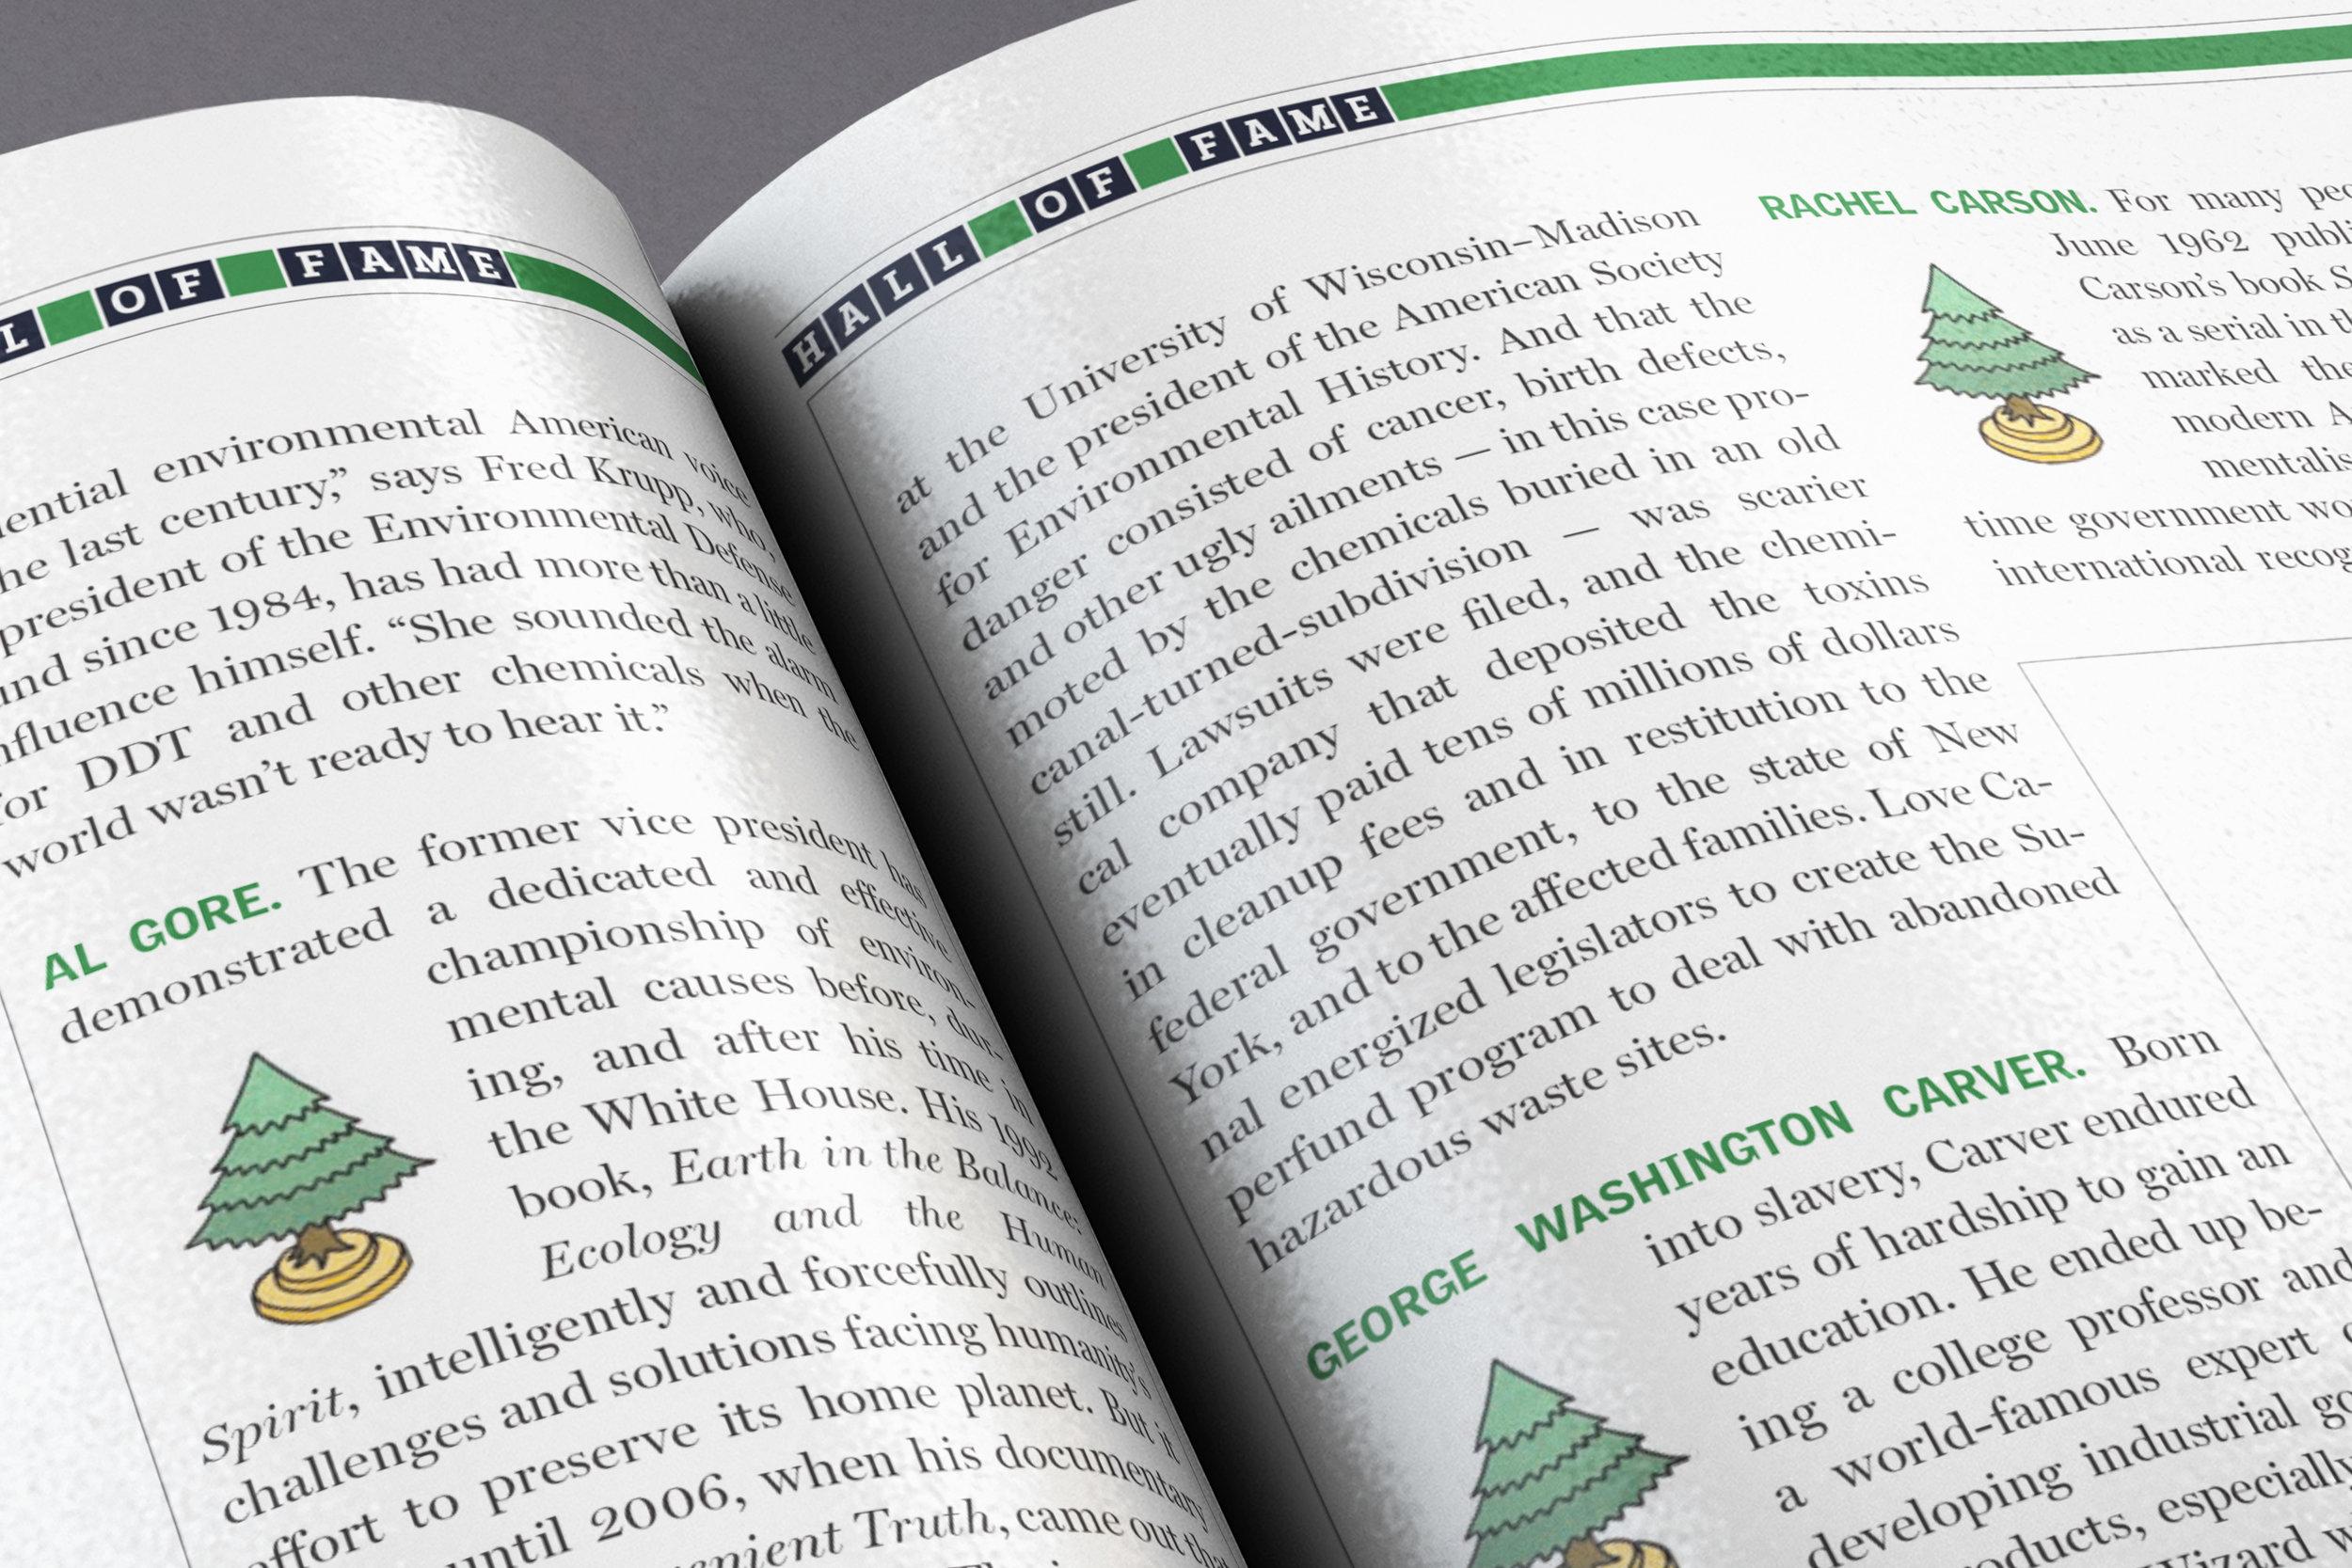 ronaldvillegas-illustration-americanway-greenhalloffame-trees.jpg